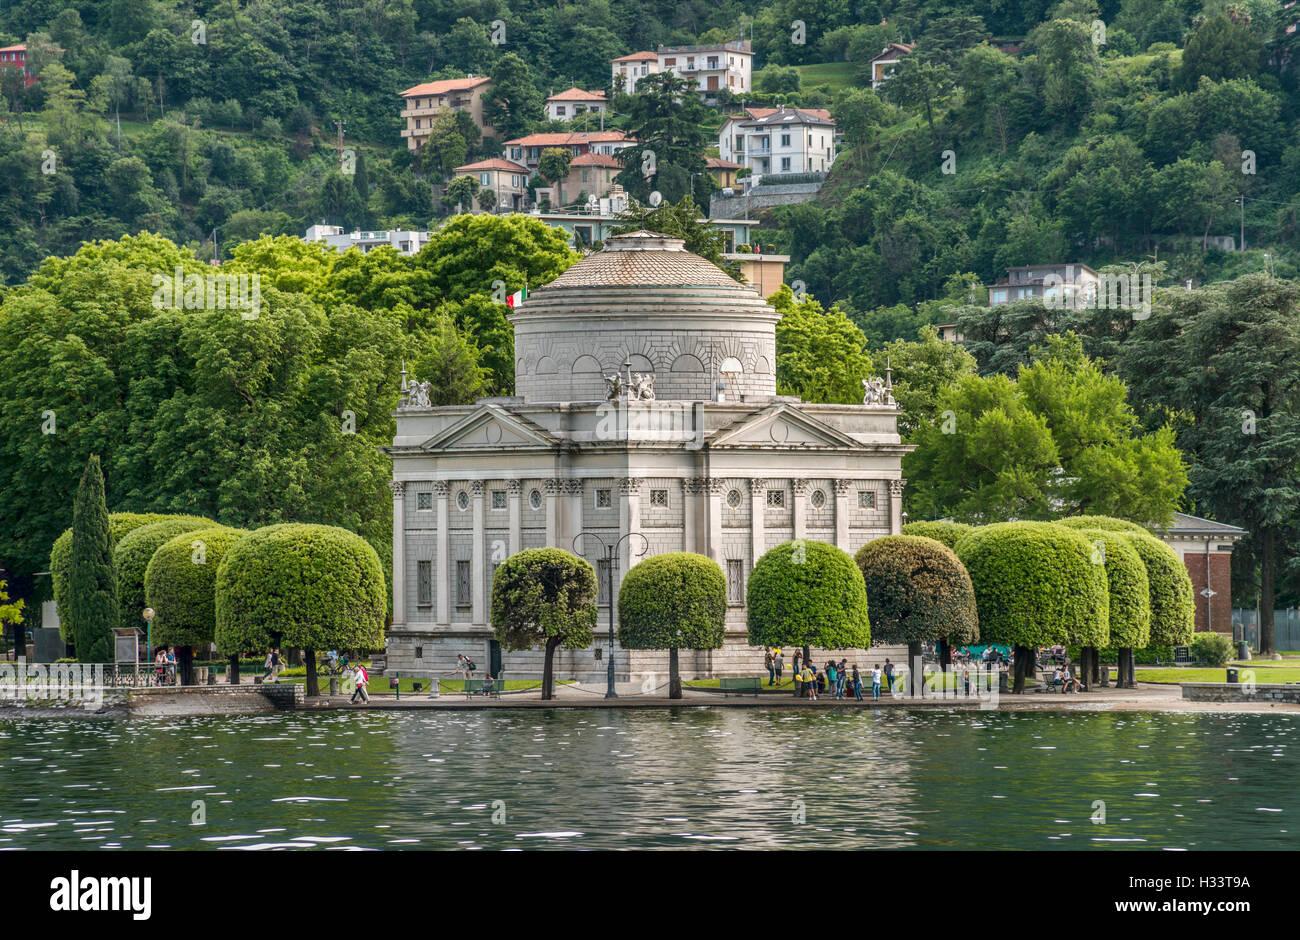 Tempio Voltiano (Volta Temple), a museum in Como, Italy, dedicated to Alessandro Volta, a scientist and inventor - Stock Image